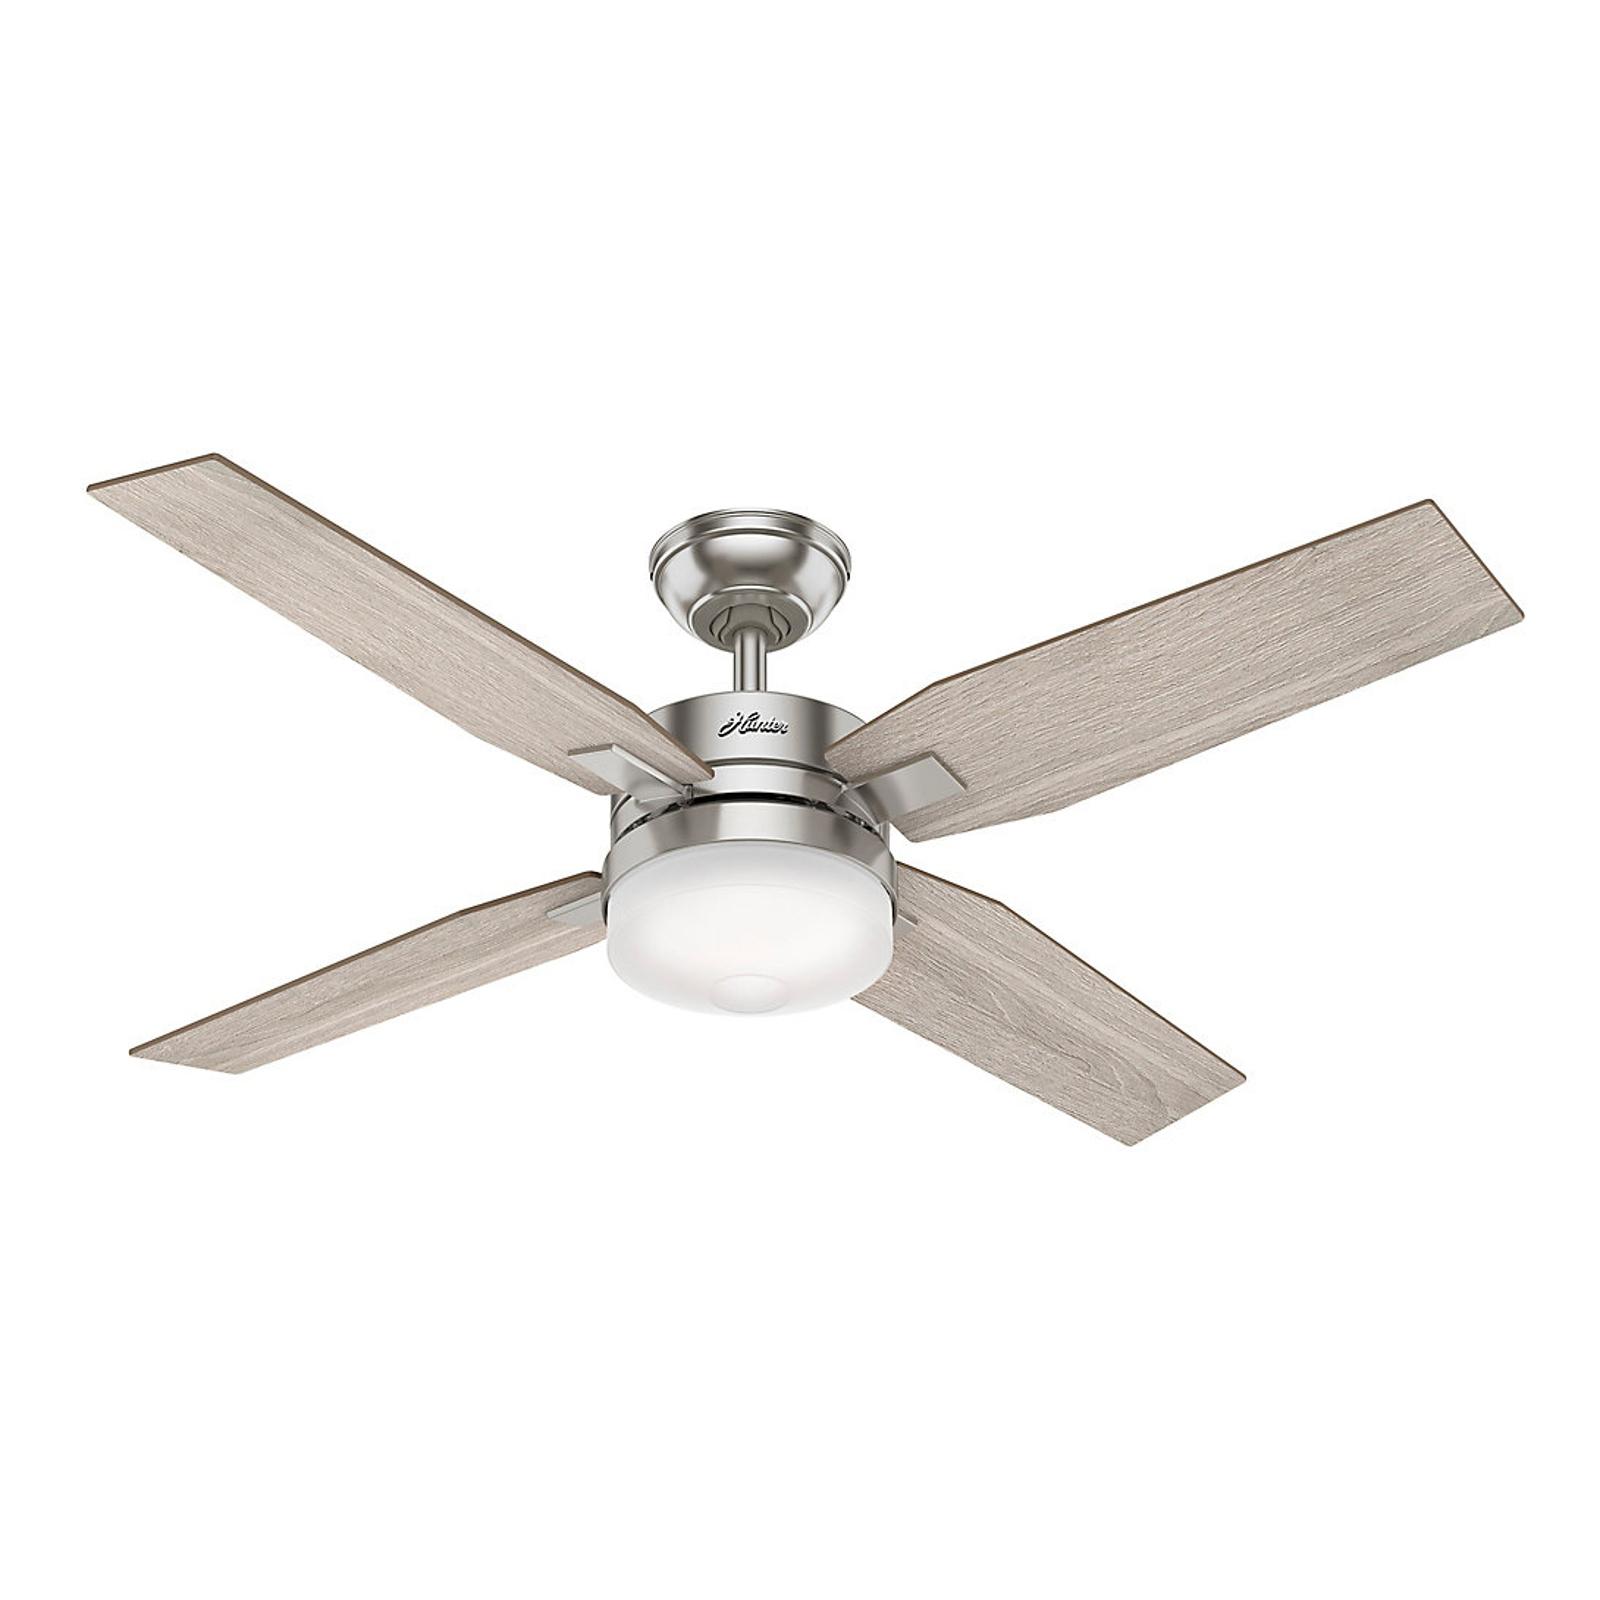 Hunter Mercadi ventilateur de plafond chêne/nickel